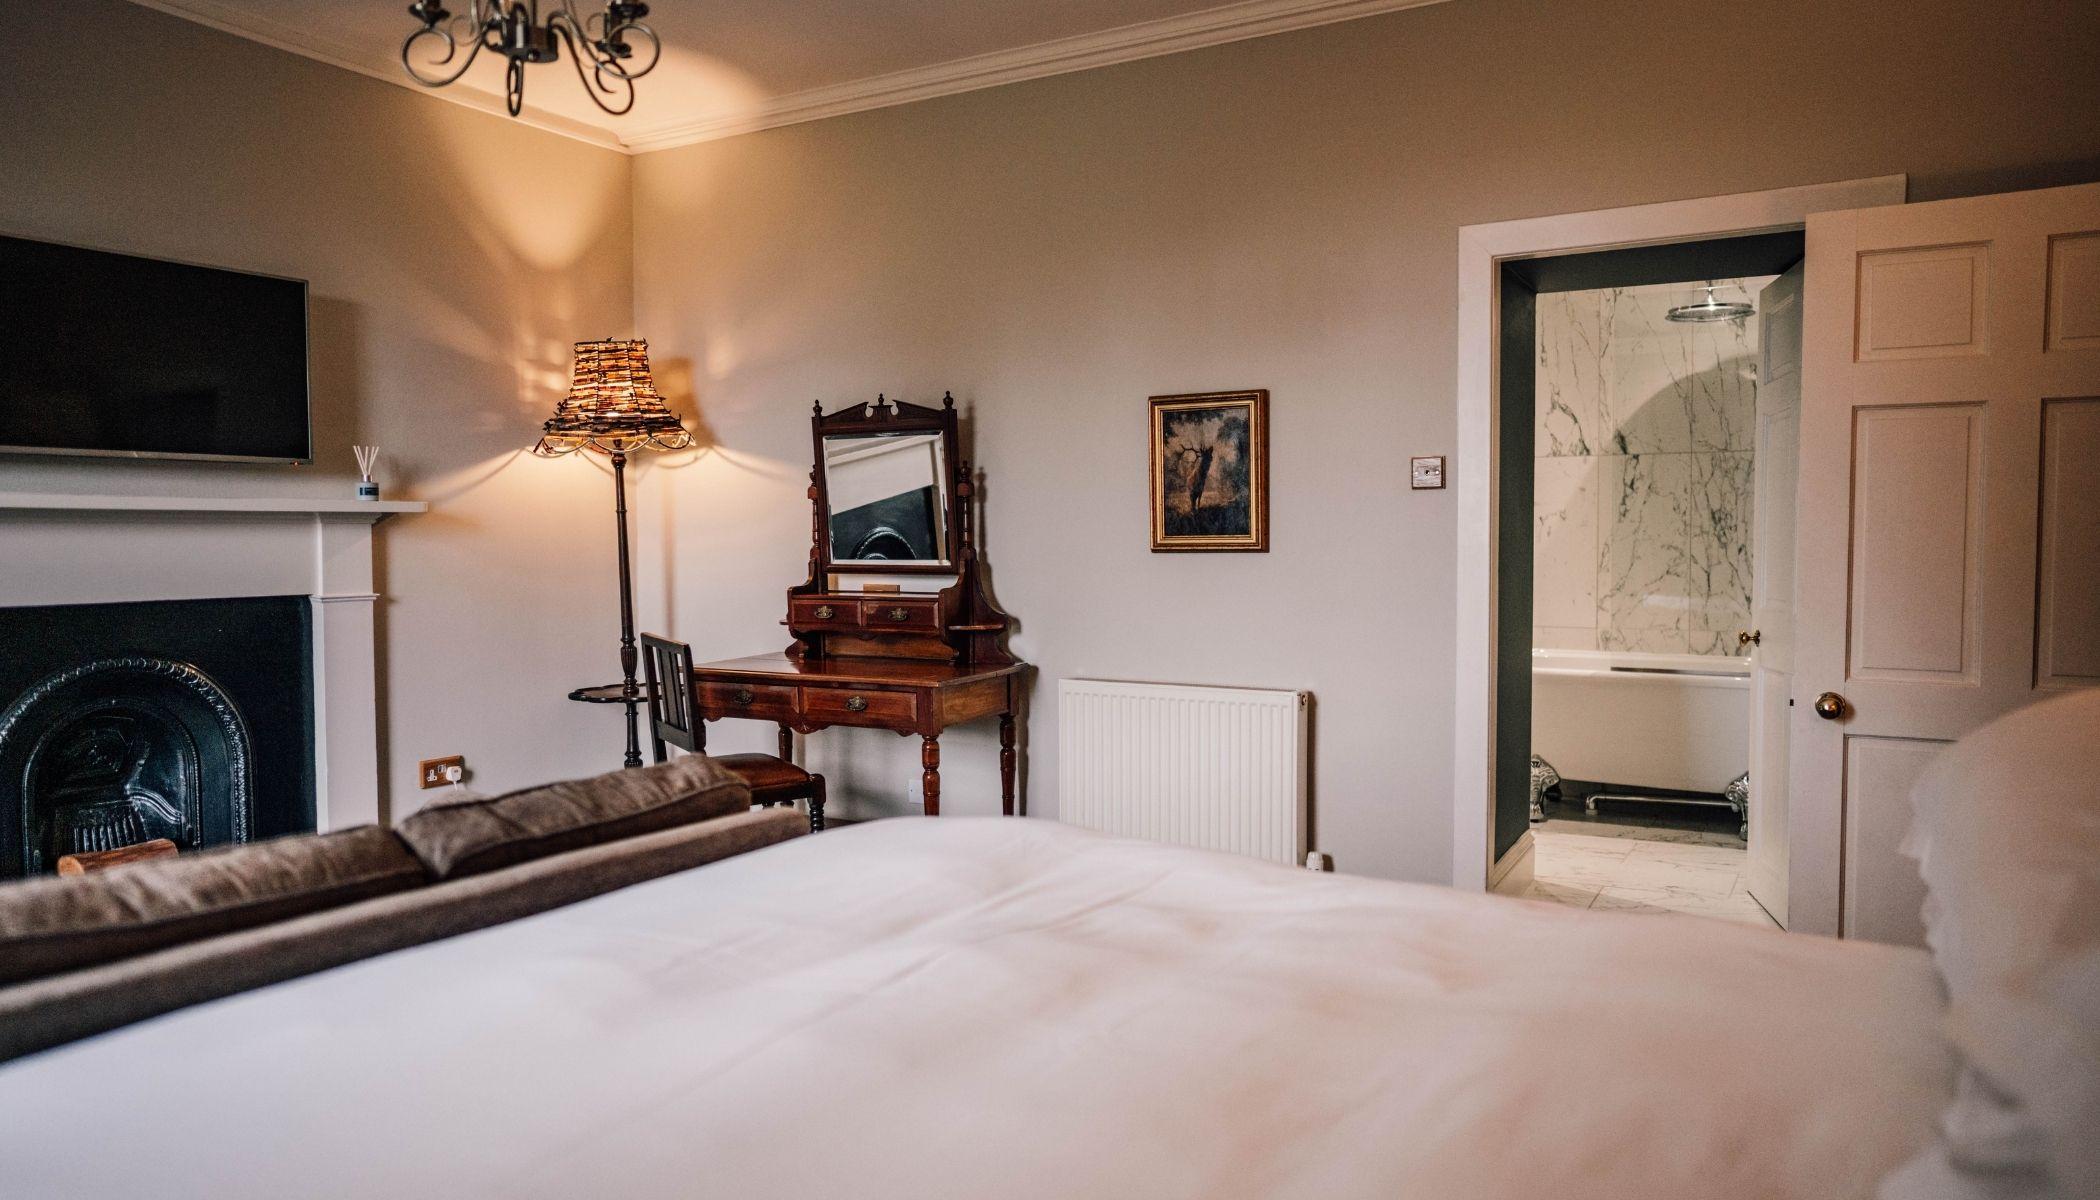 Torran - Radclyffe Bedroom